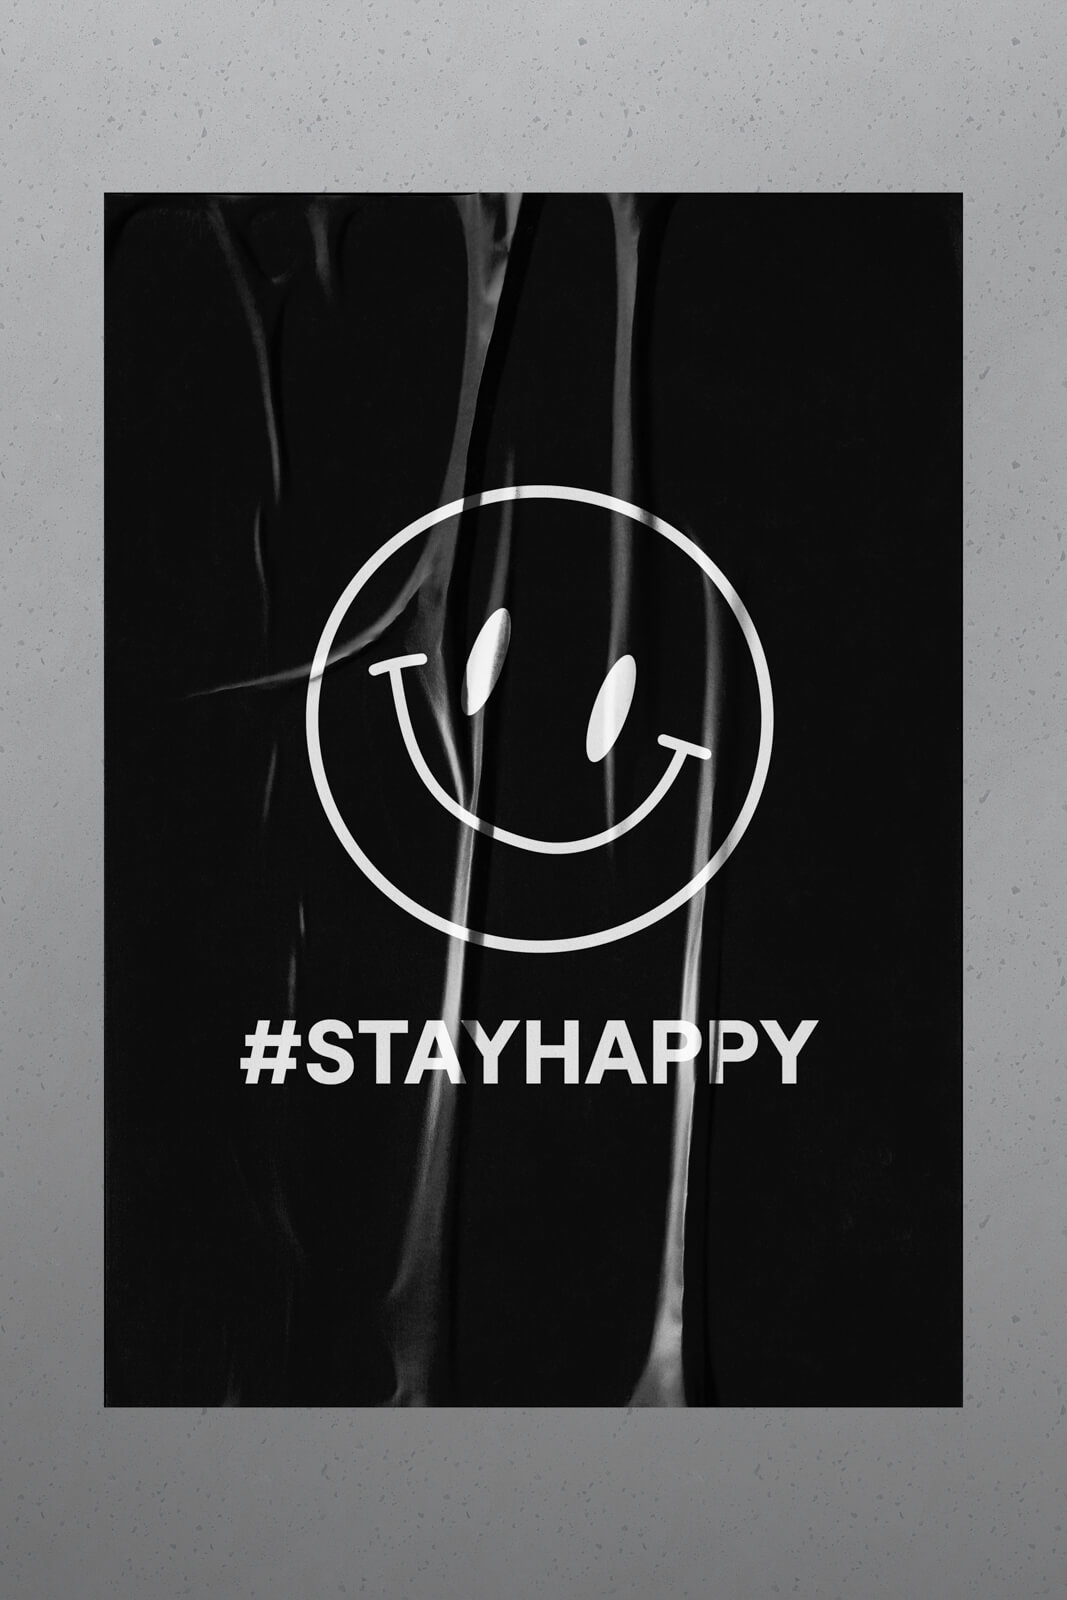 Stayhappy